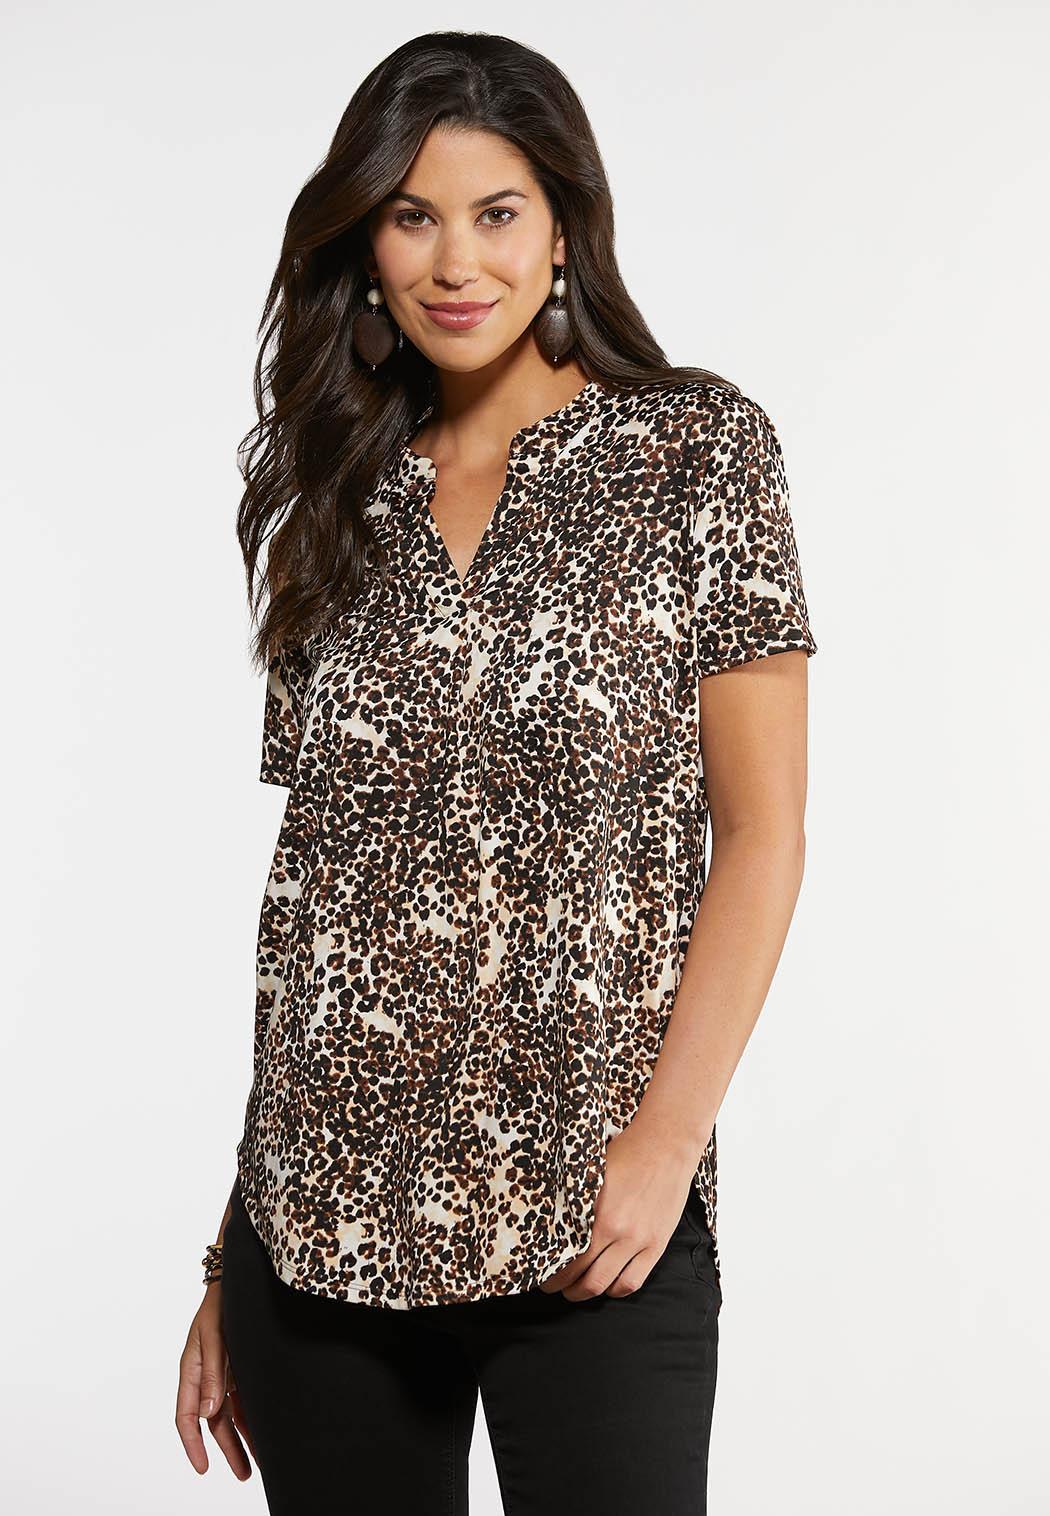 Plus Size Cheetah Print Top